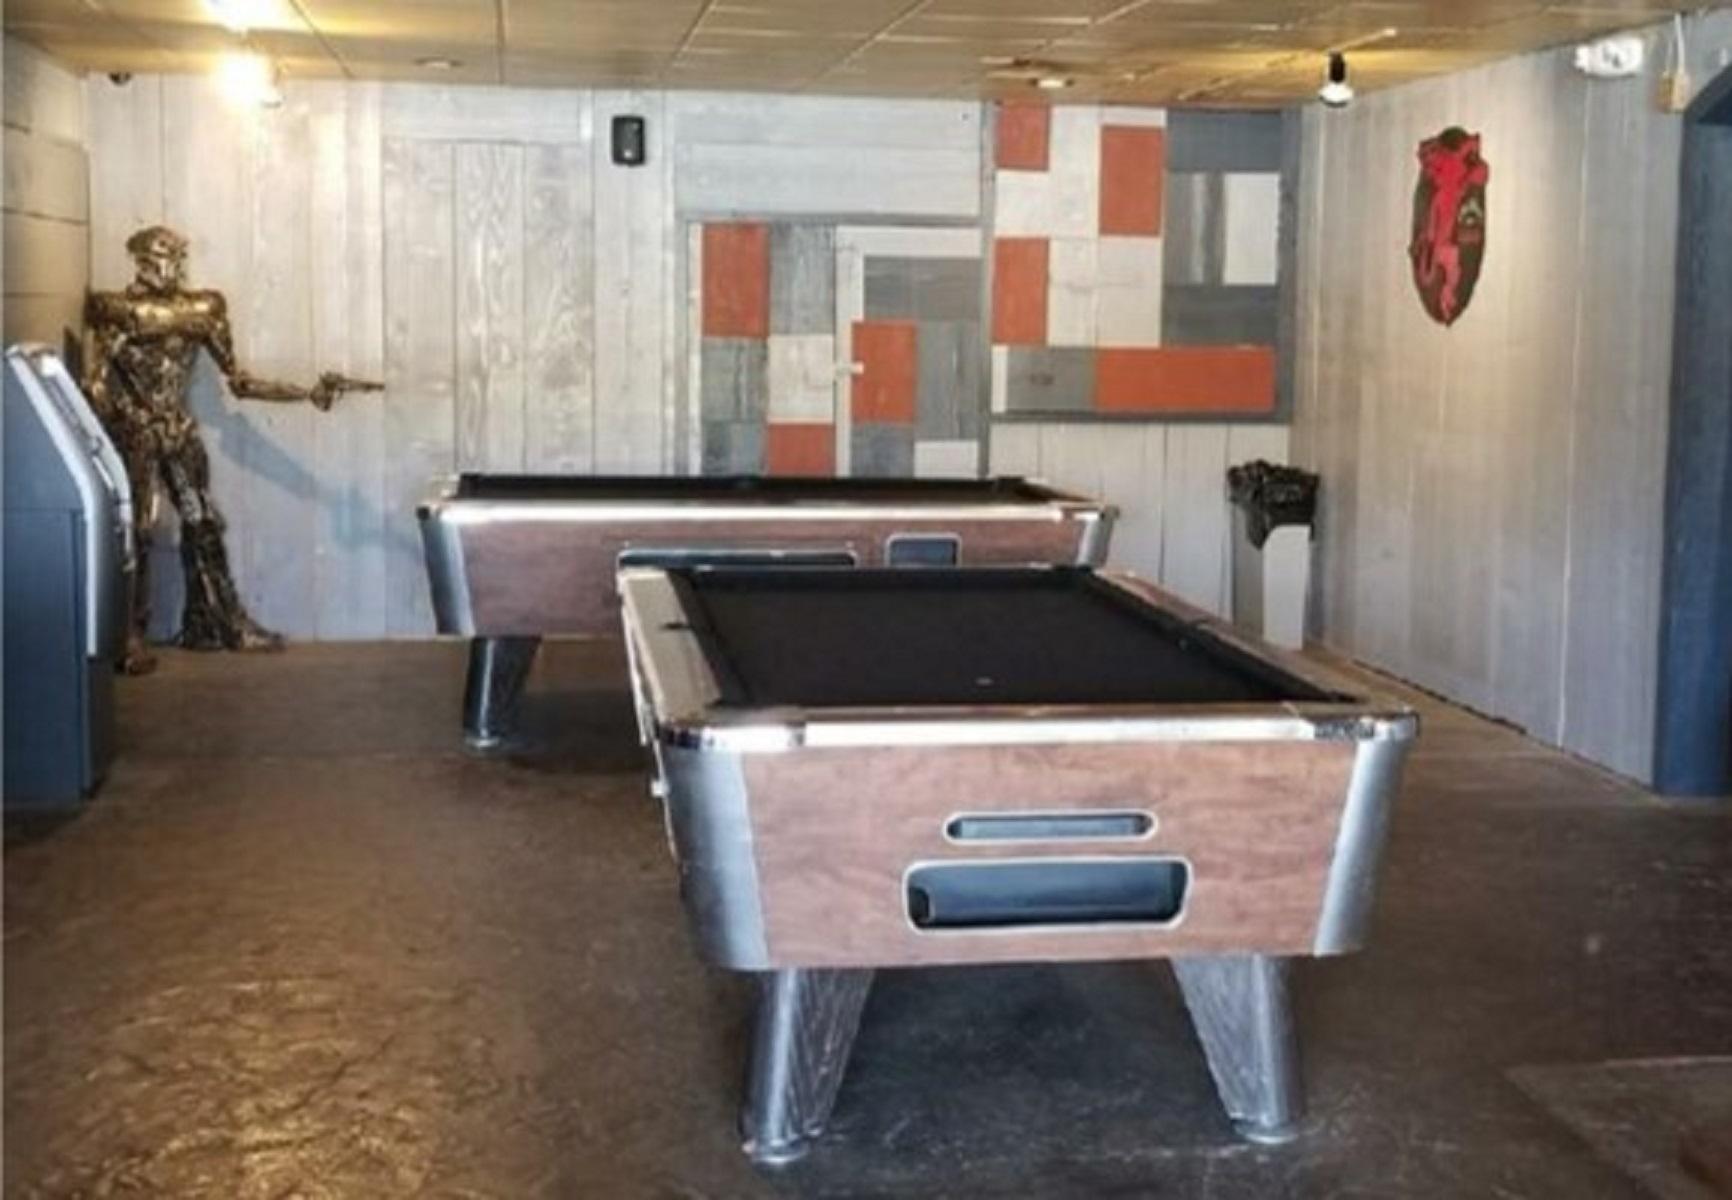 Rhythm and Booze South Pool Room with metal man